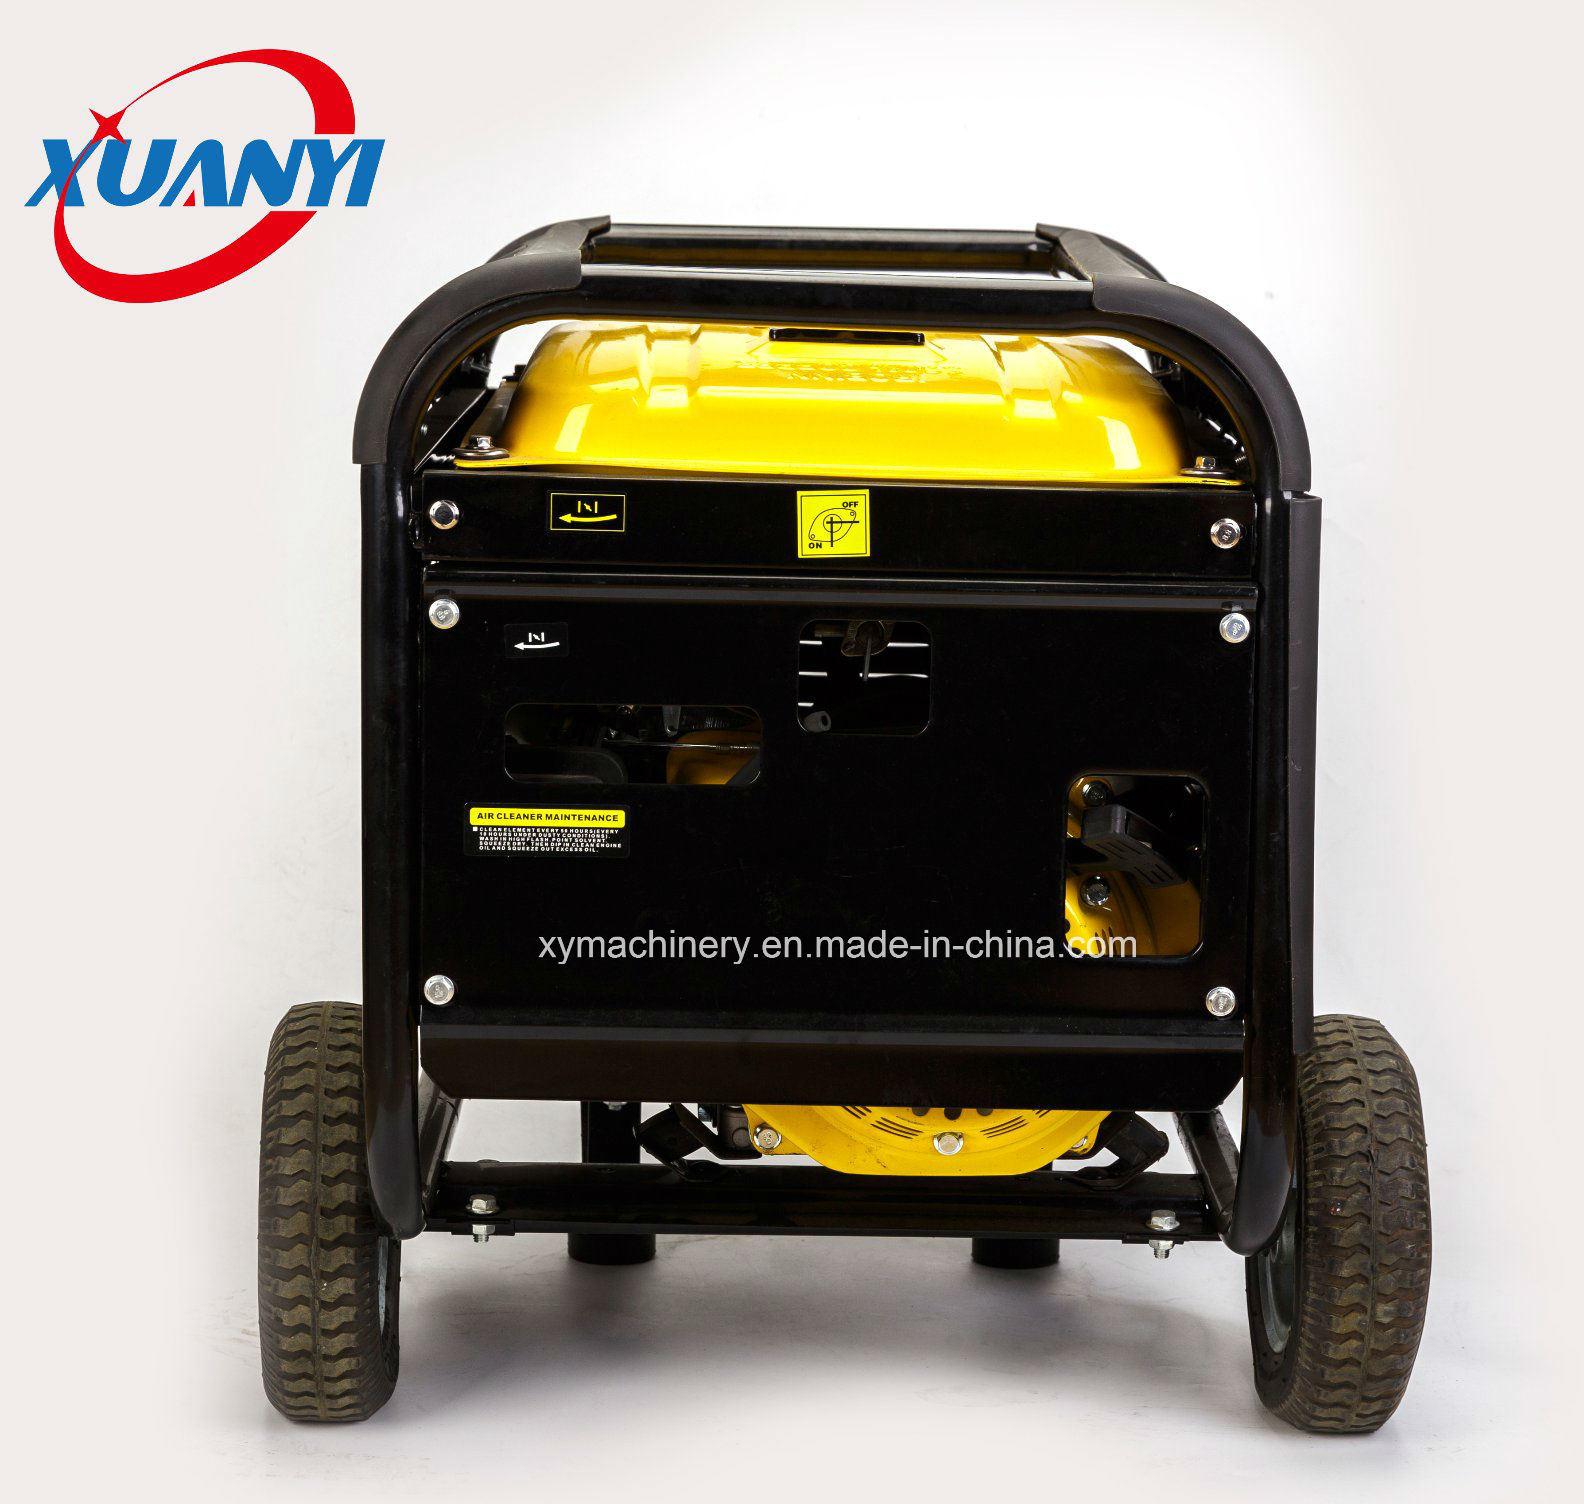 Hot Sale 100% Copper Wire 3kw Portable Power Gasoline Generator Alternator